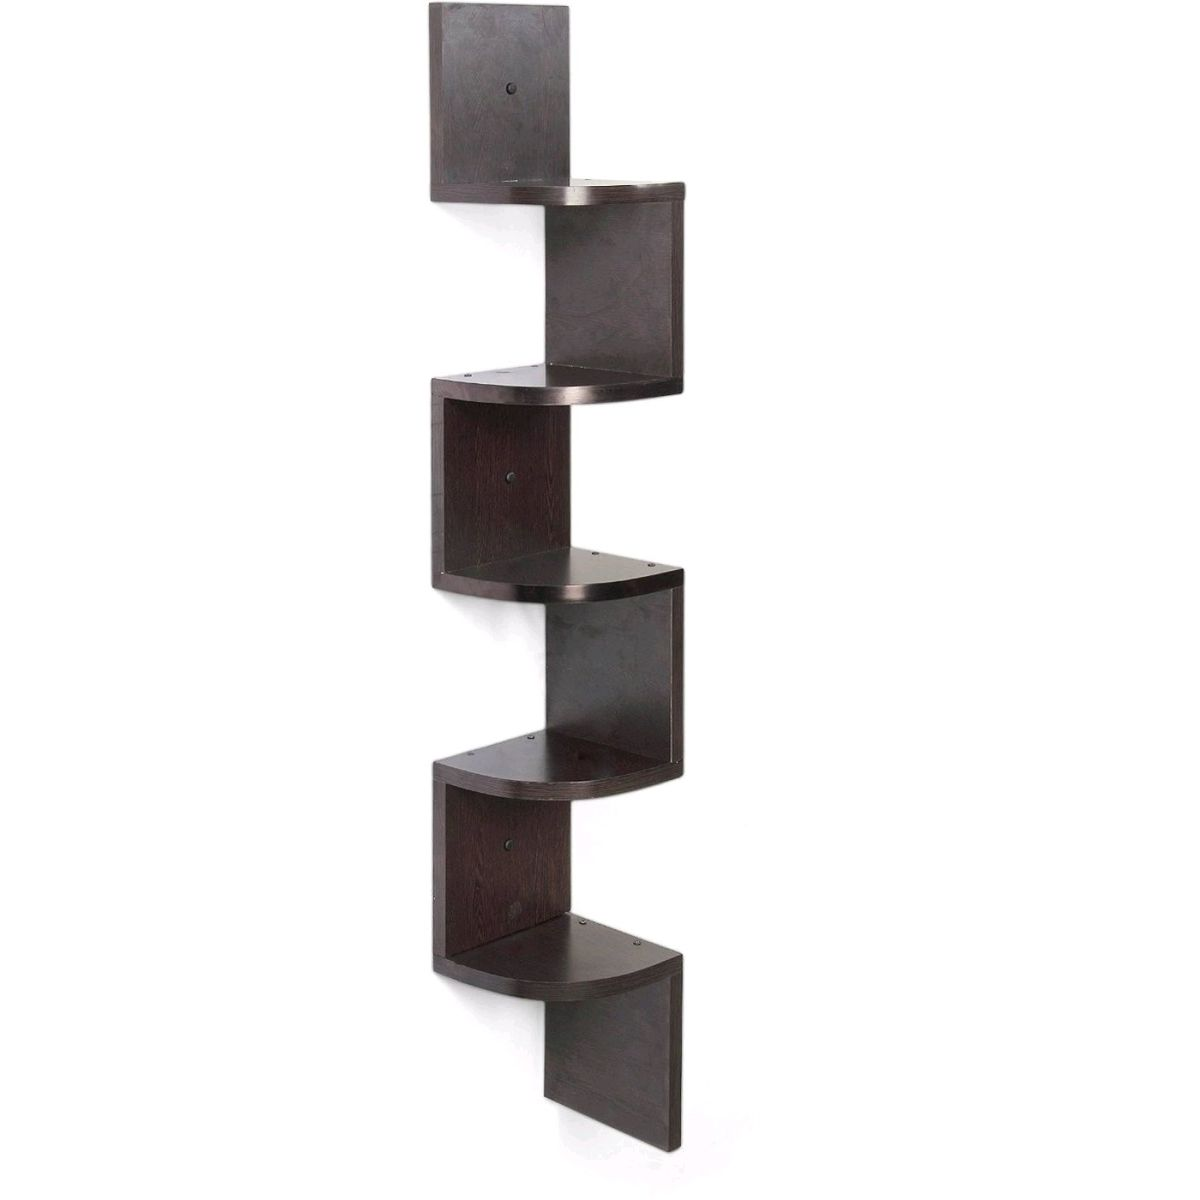 Imaginary Products Zigzag Wall Corner